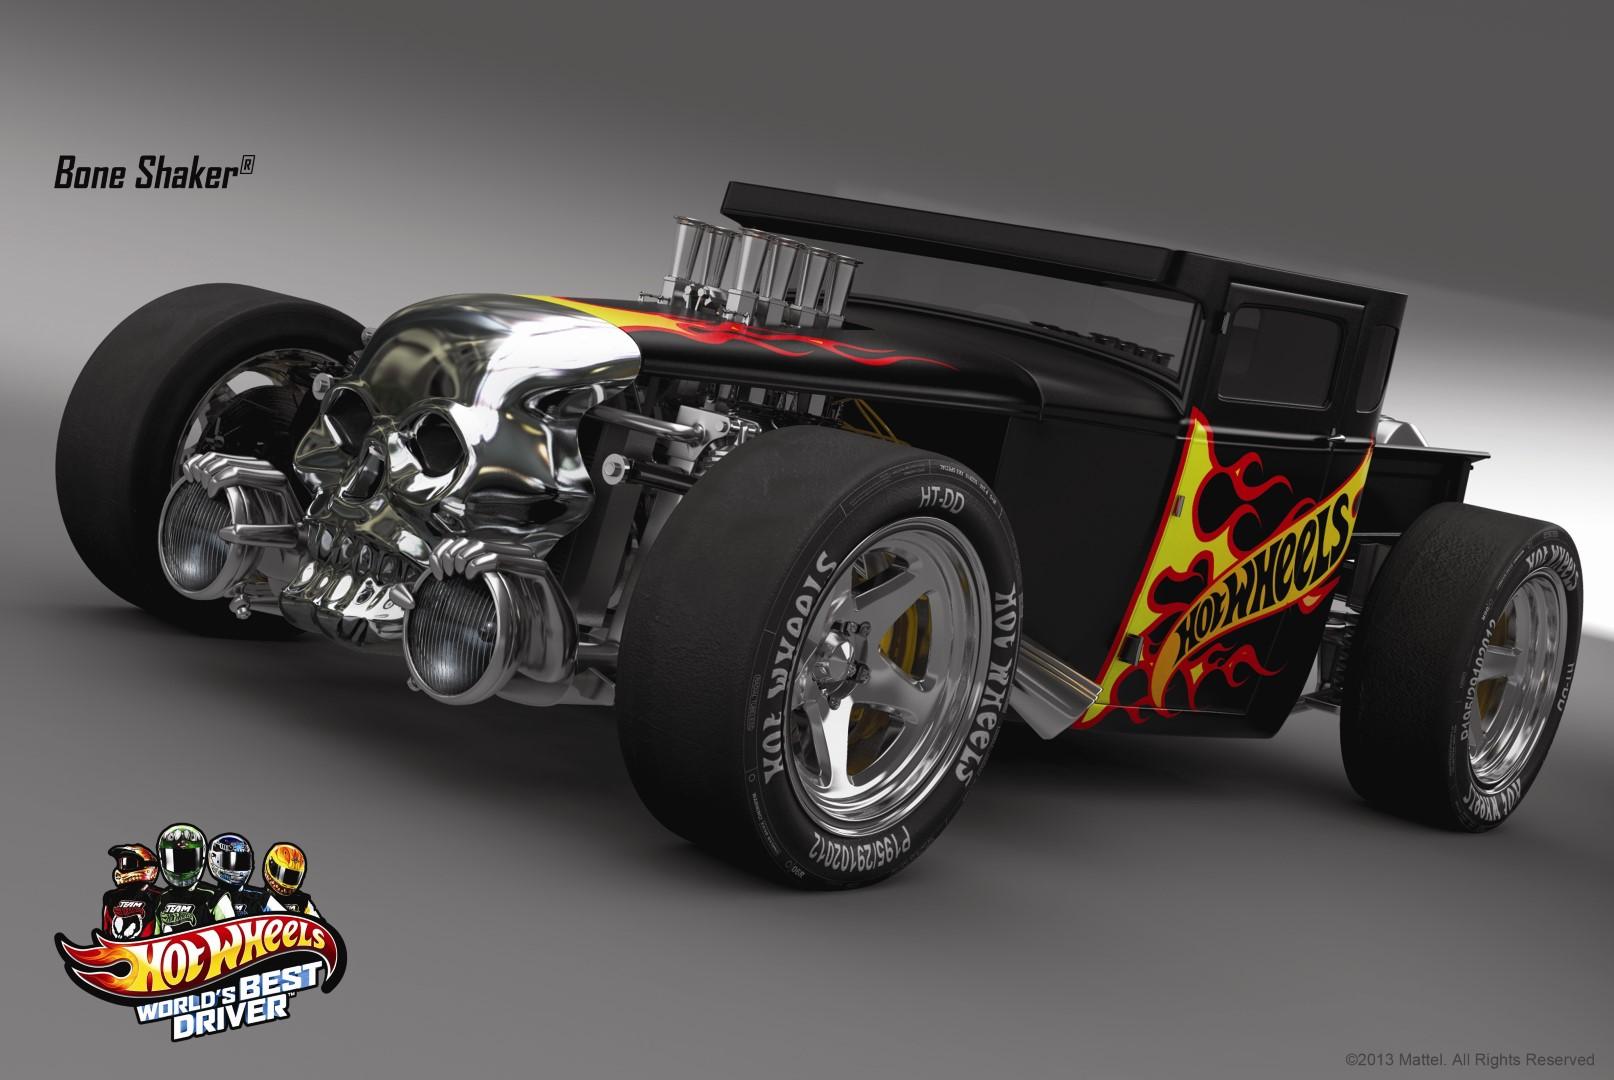 hot wheels world 39 s best driver gets launch trailer. Black Bedroom Furniture Sets. Home Design Ideas